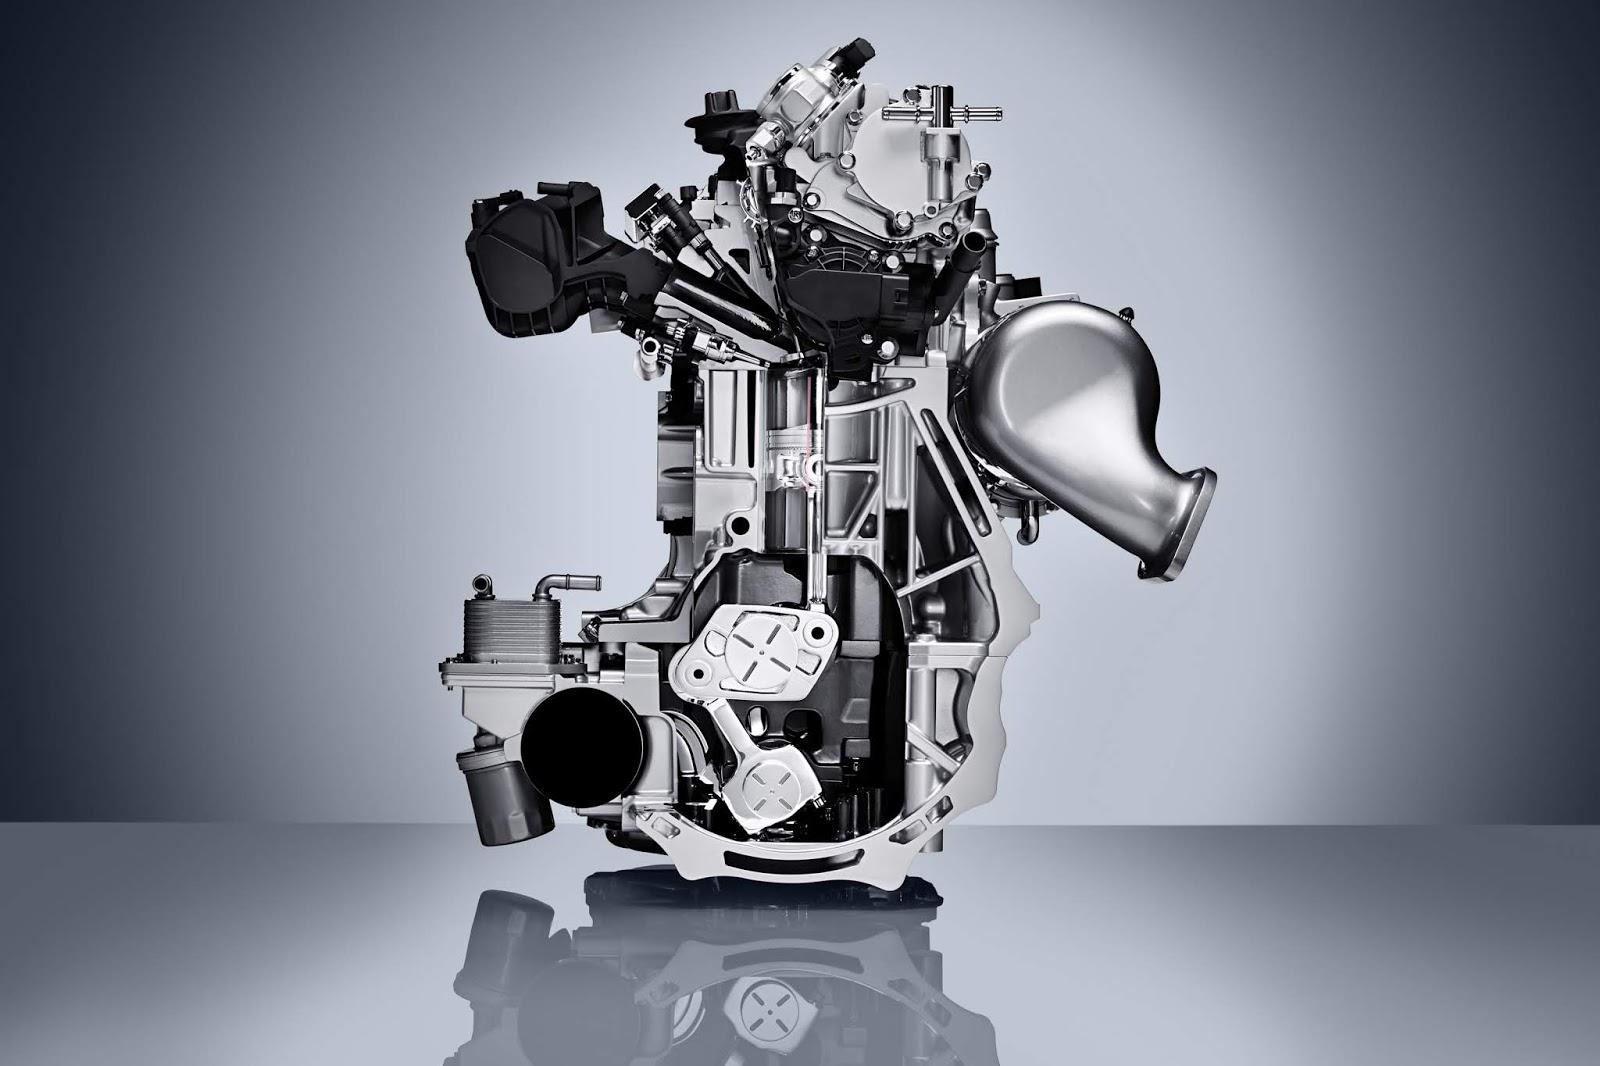 Infiniti2Bvc2Bturbo2Bengine Στους κορυφαίους κινητήρες του 2019 ο VC-Turbo της INFINITI Nissan, zblog, Τεχνολογία